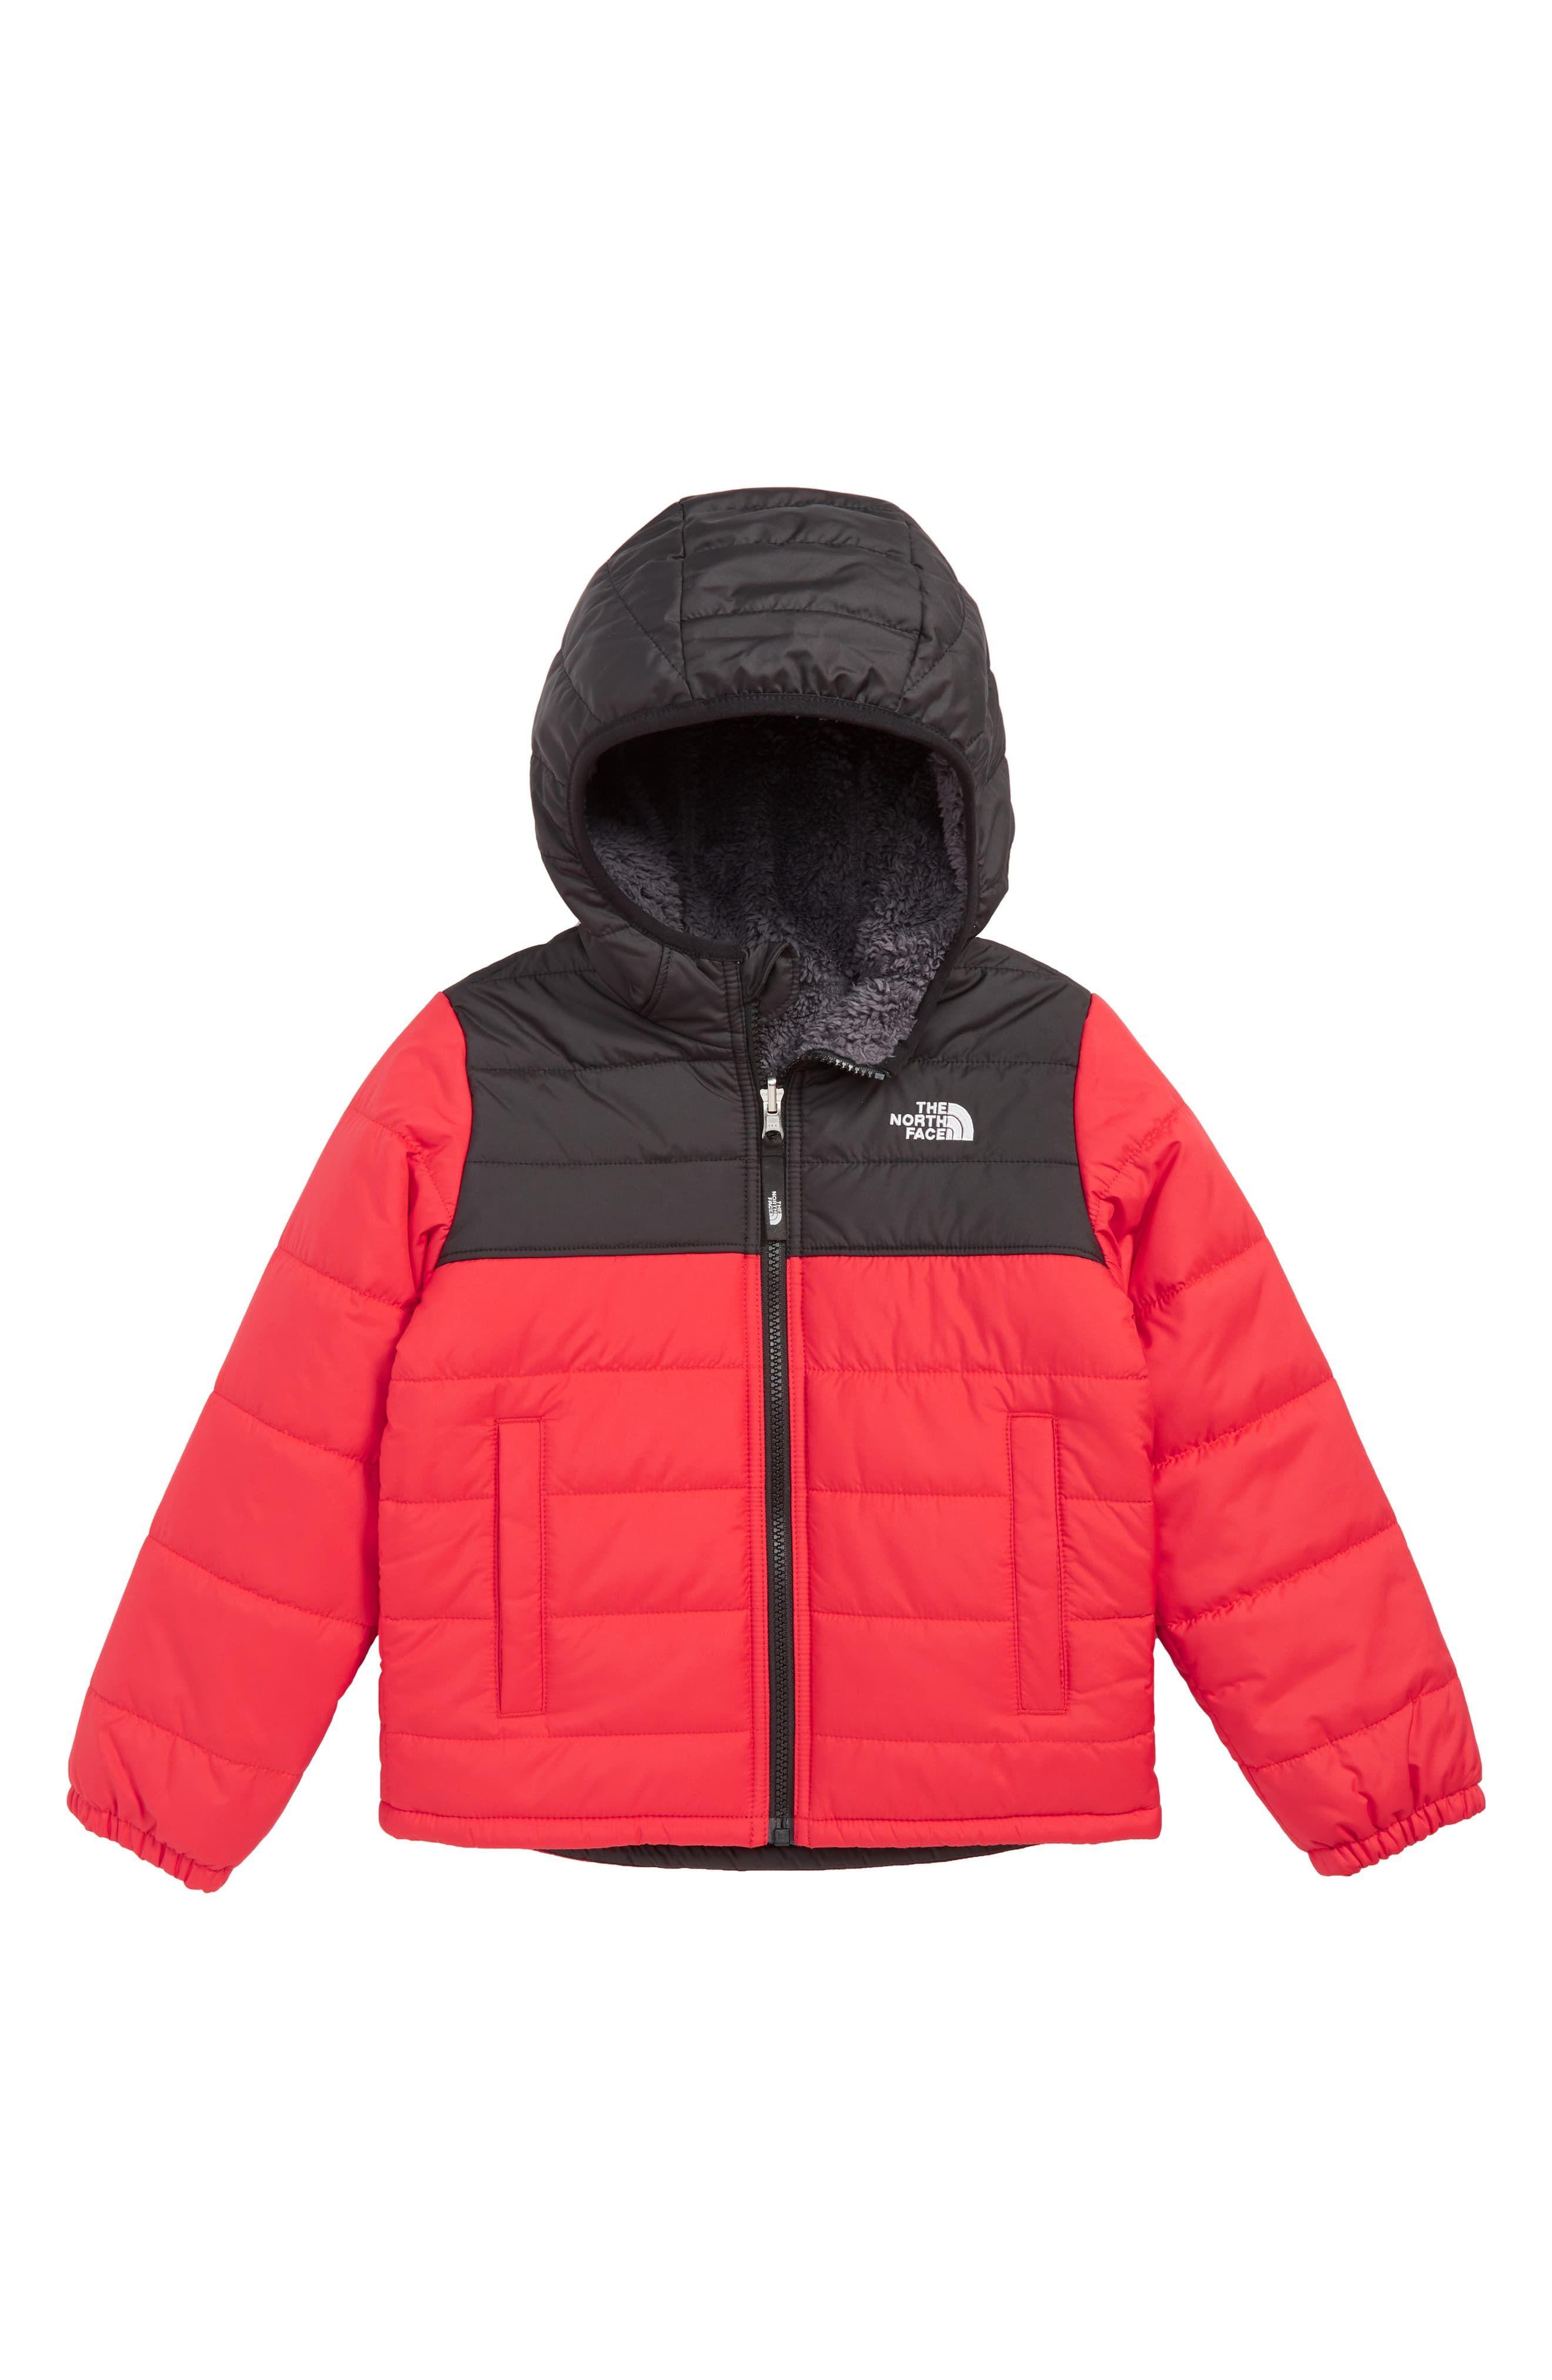 The North Face Chimborazo Reversible Jacket Toddler Boys Little Boys Nordstrom Reversible Jackets Cozy Jacket Jackets [ 4048 x 2640 Pixel ]